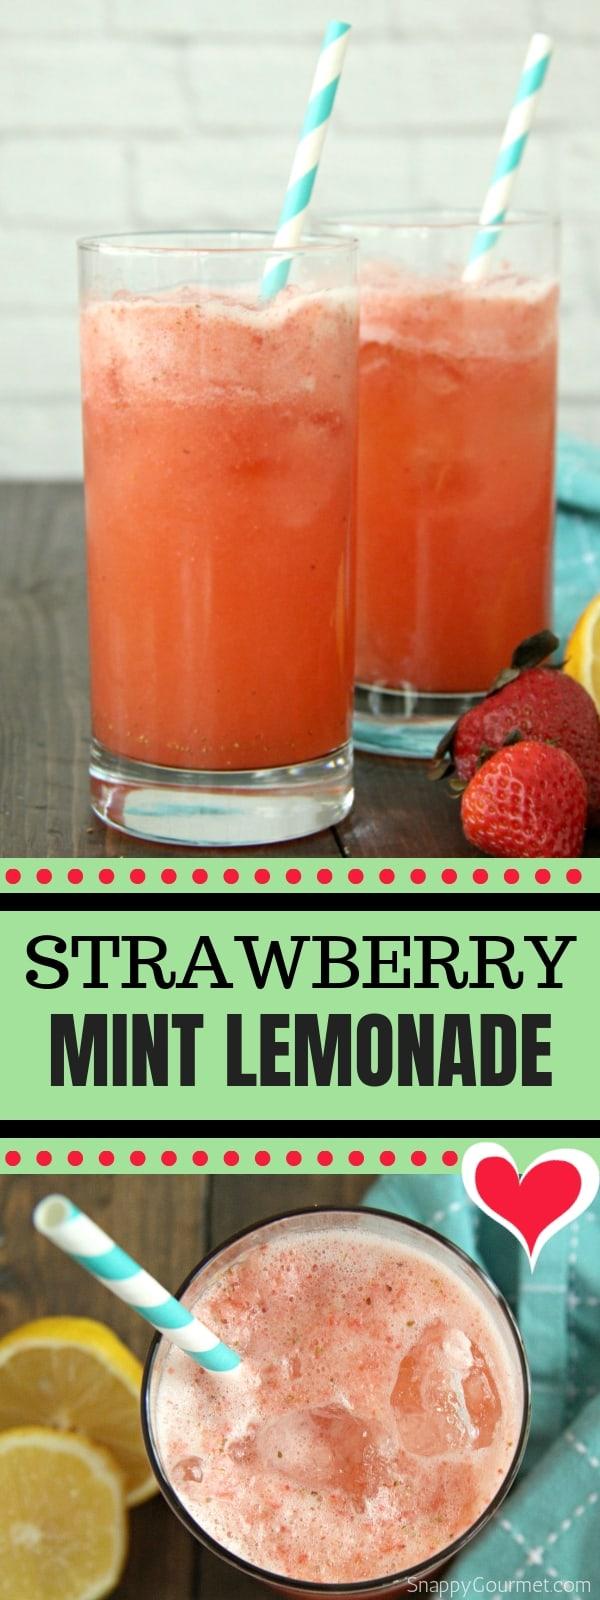 Strawberry Mint Lemonade photo collage